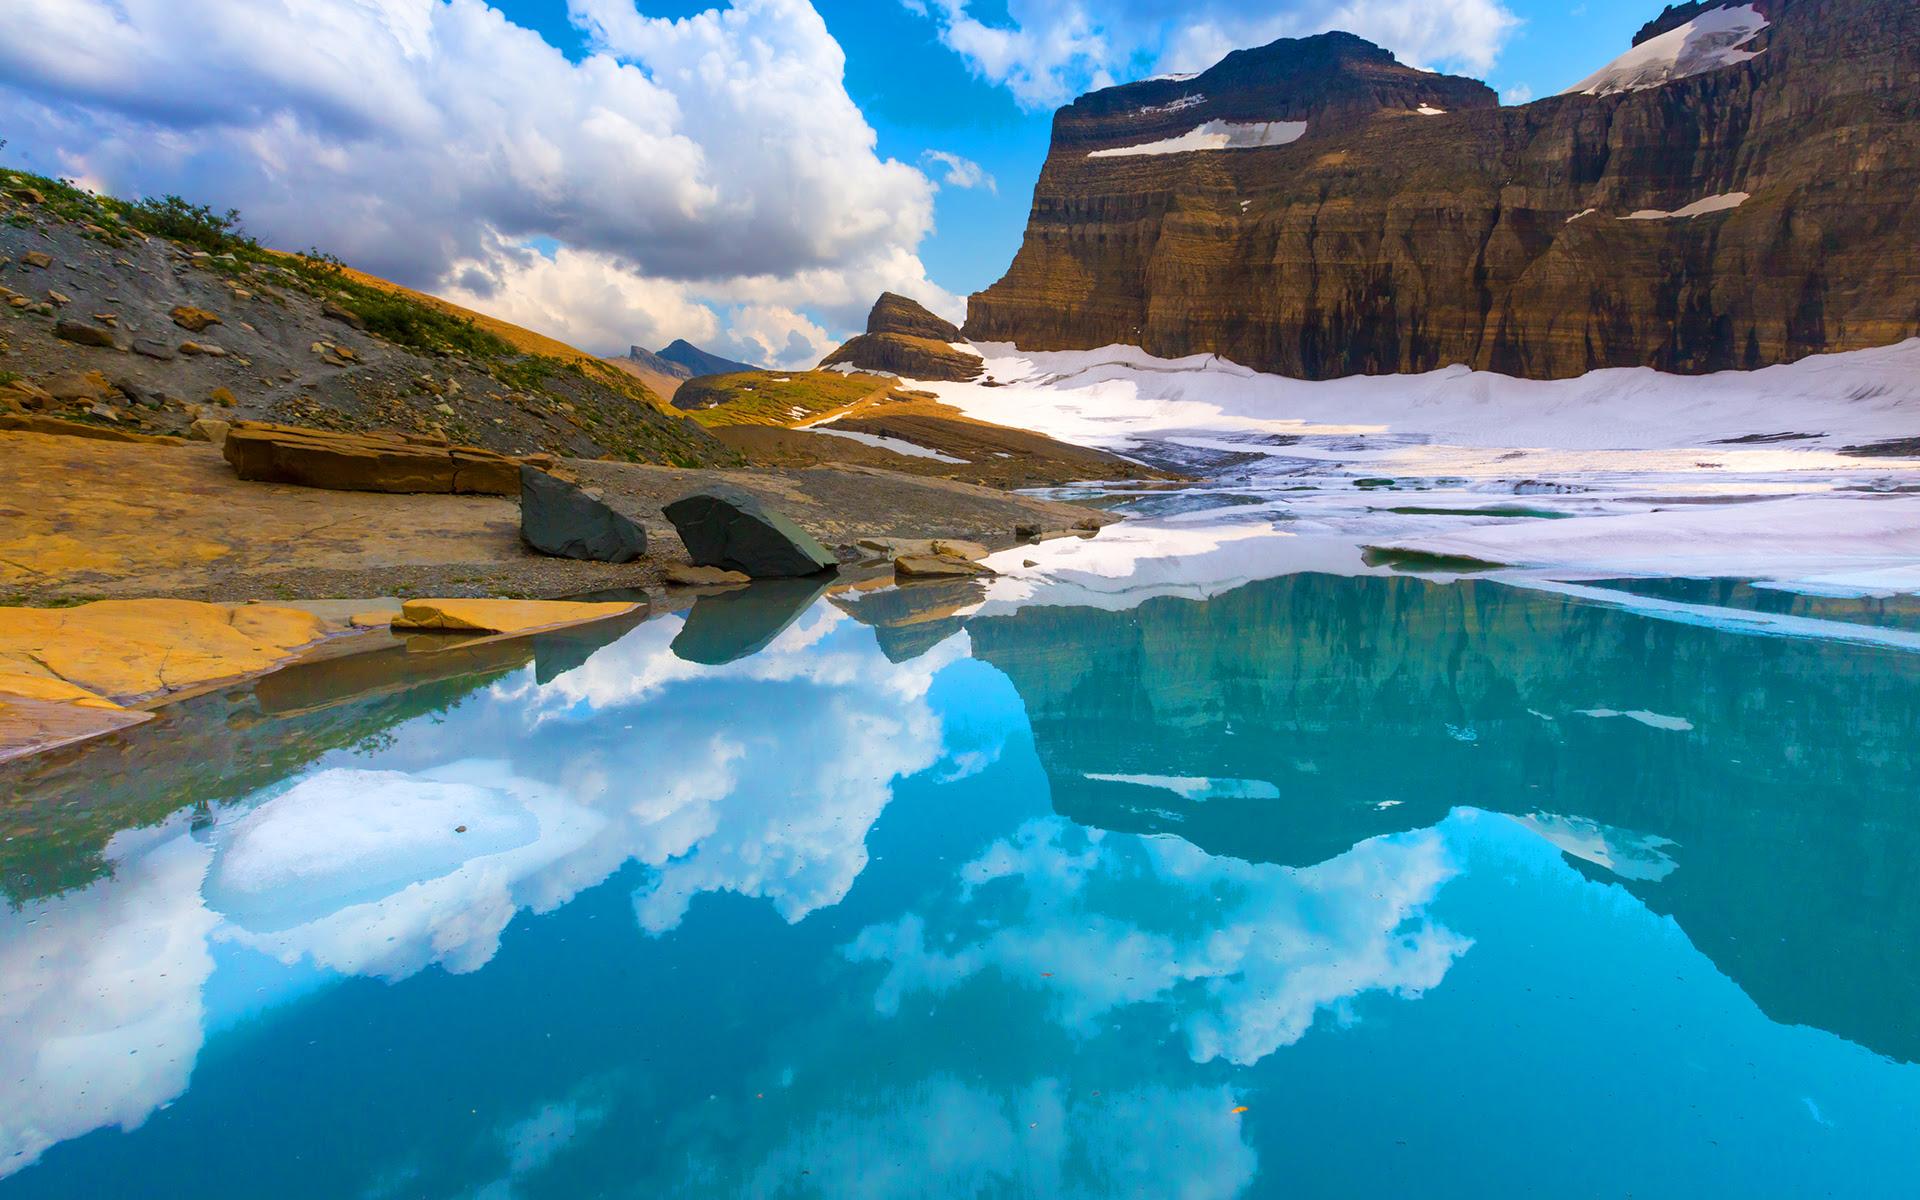 Grinnell Glacier National Park Wallpaper 1920x1200 30544